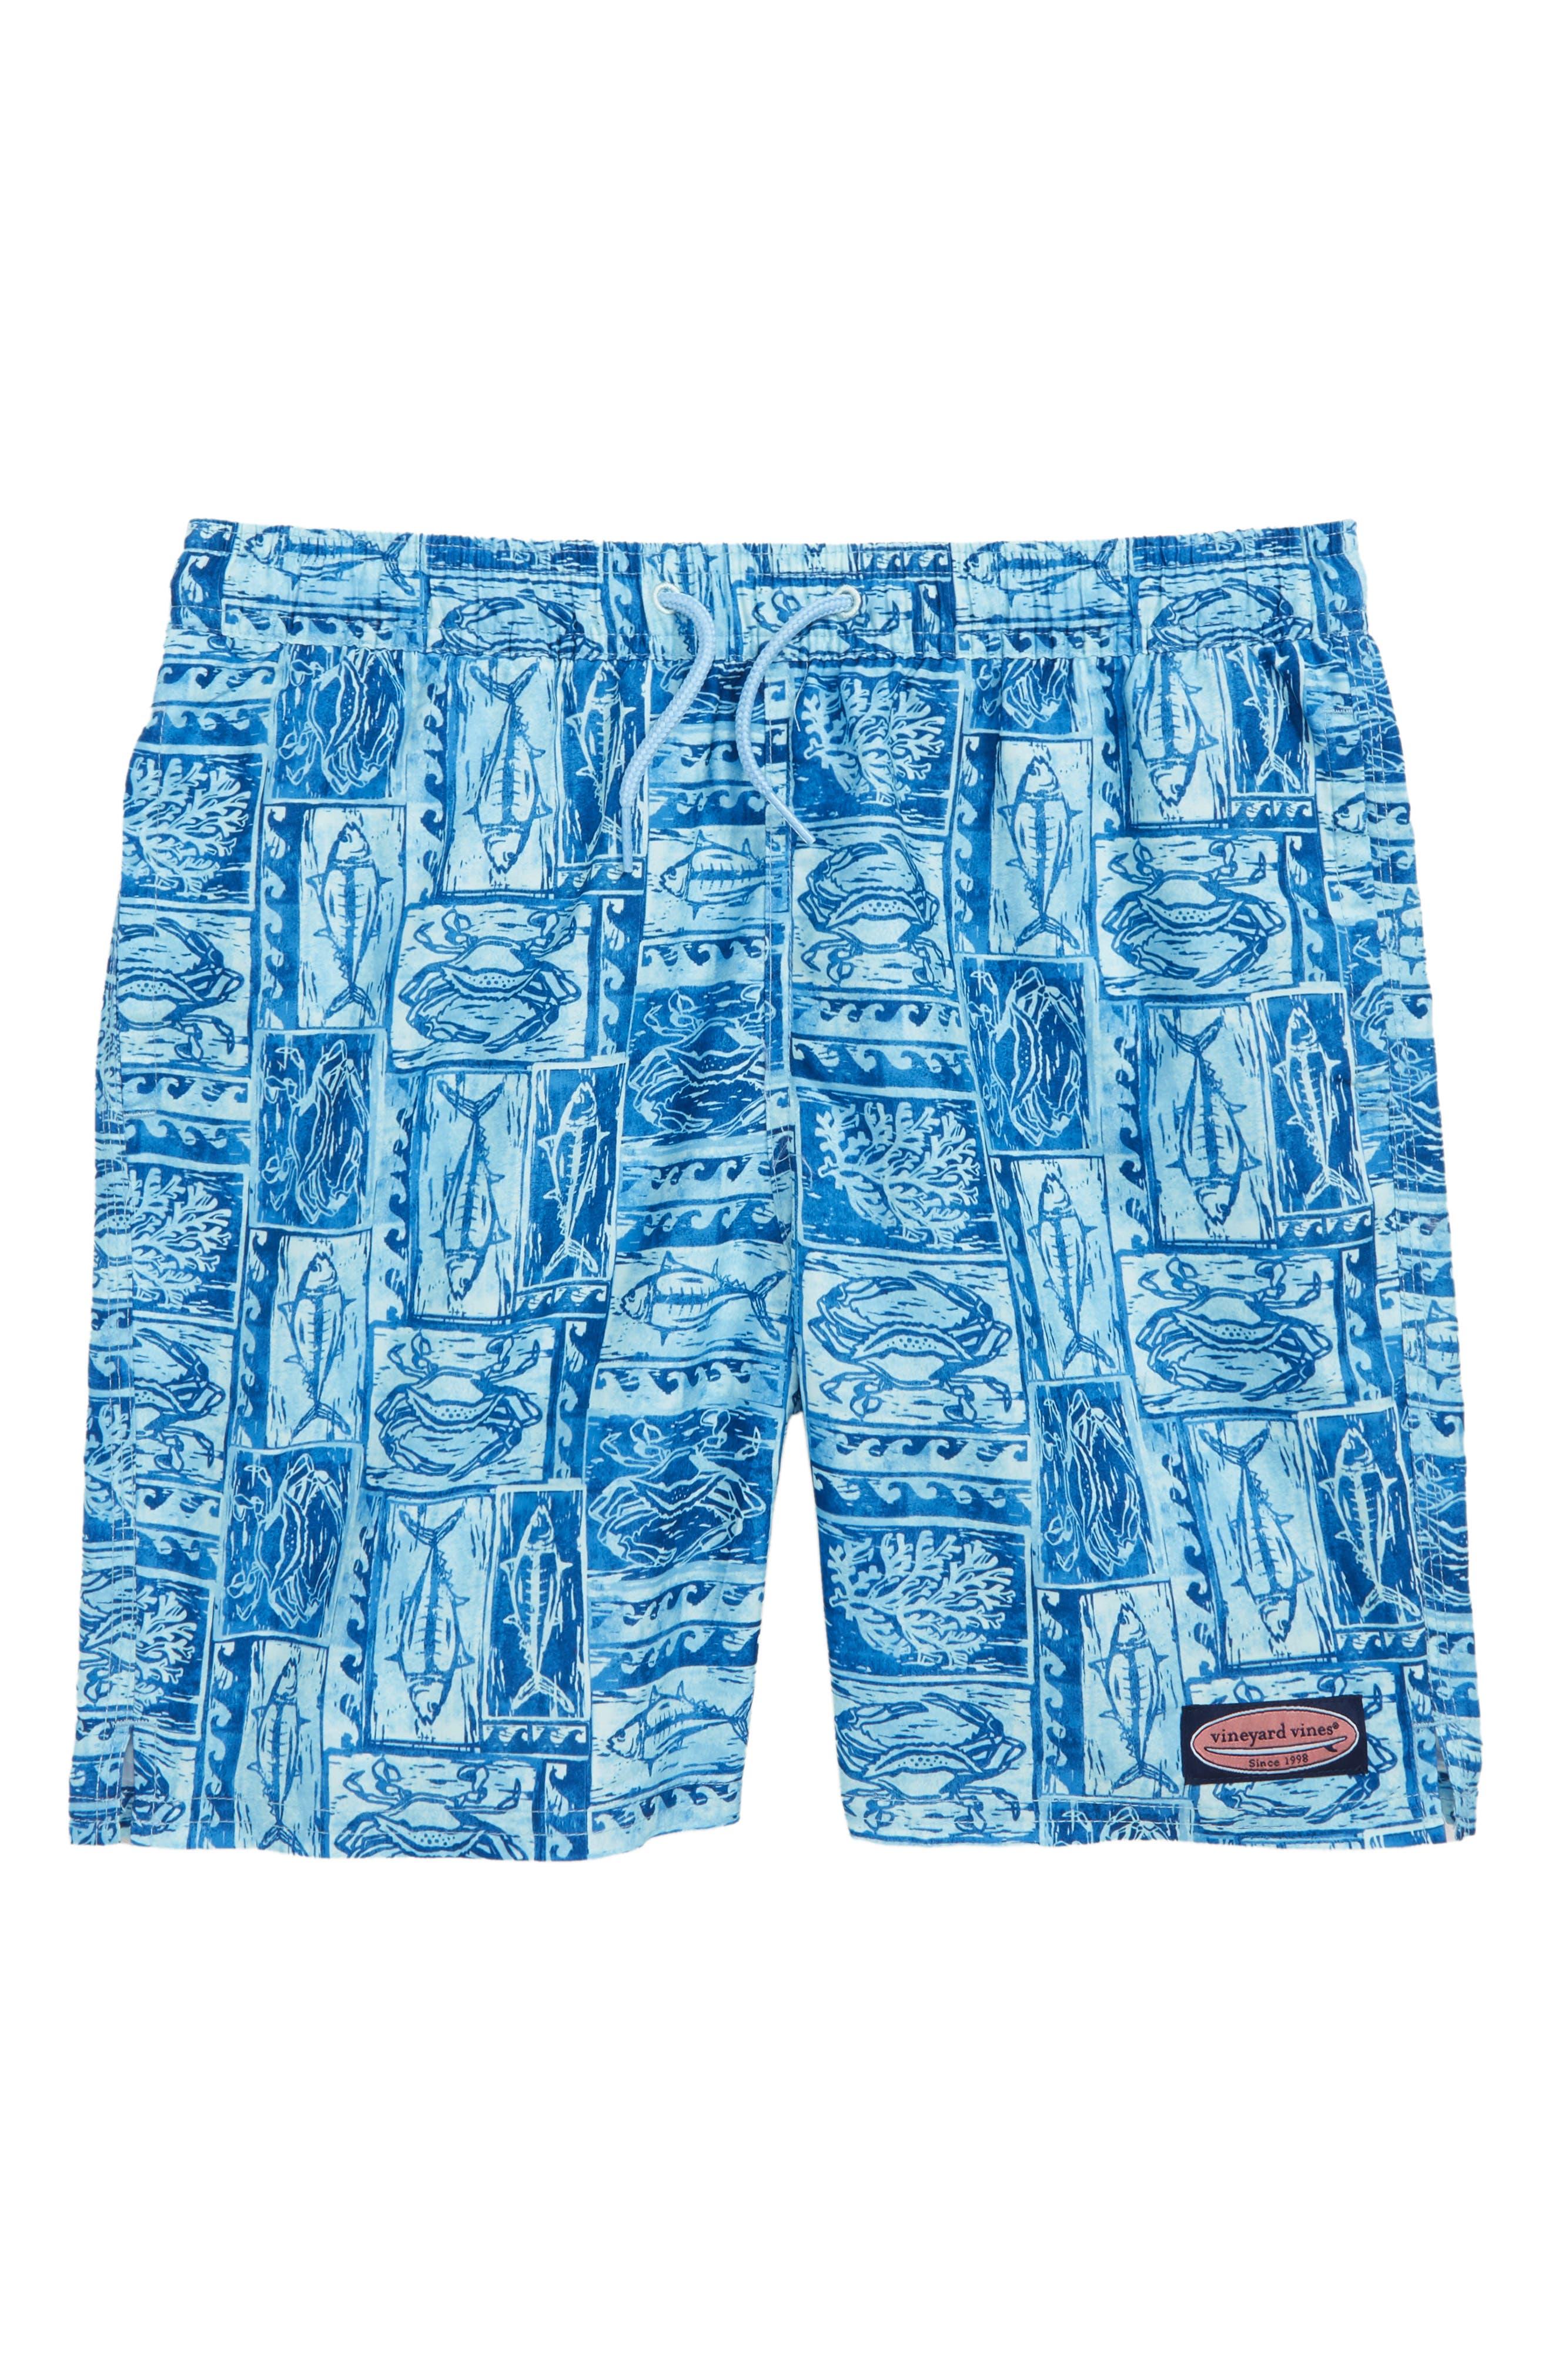 Chappy Woodblock Sea Life Swim Trunks,                         Main,                         color, JAKE BLUE